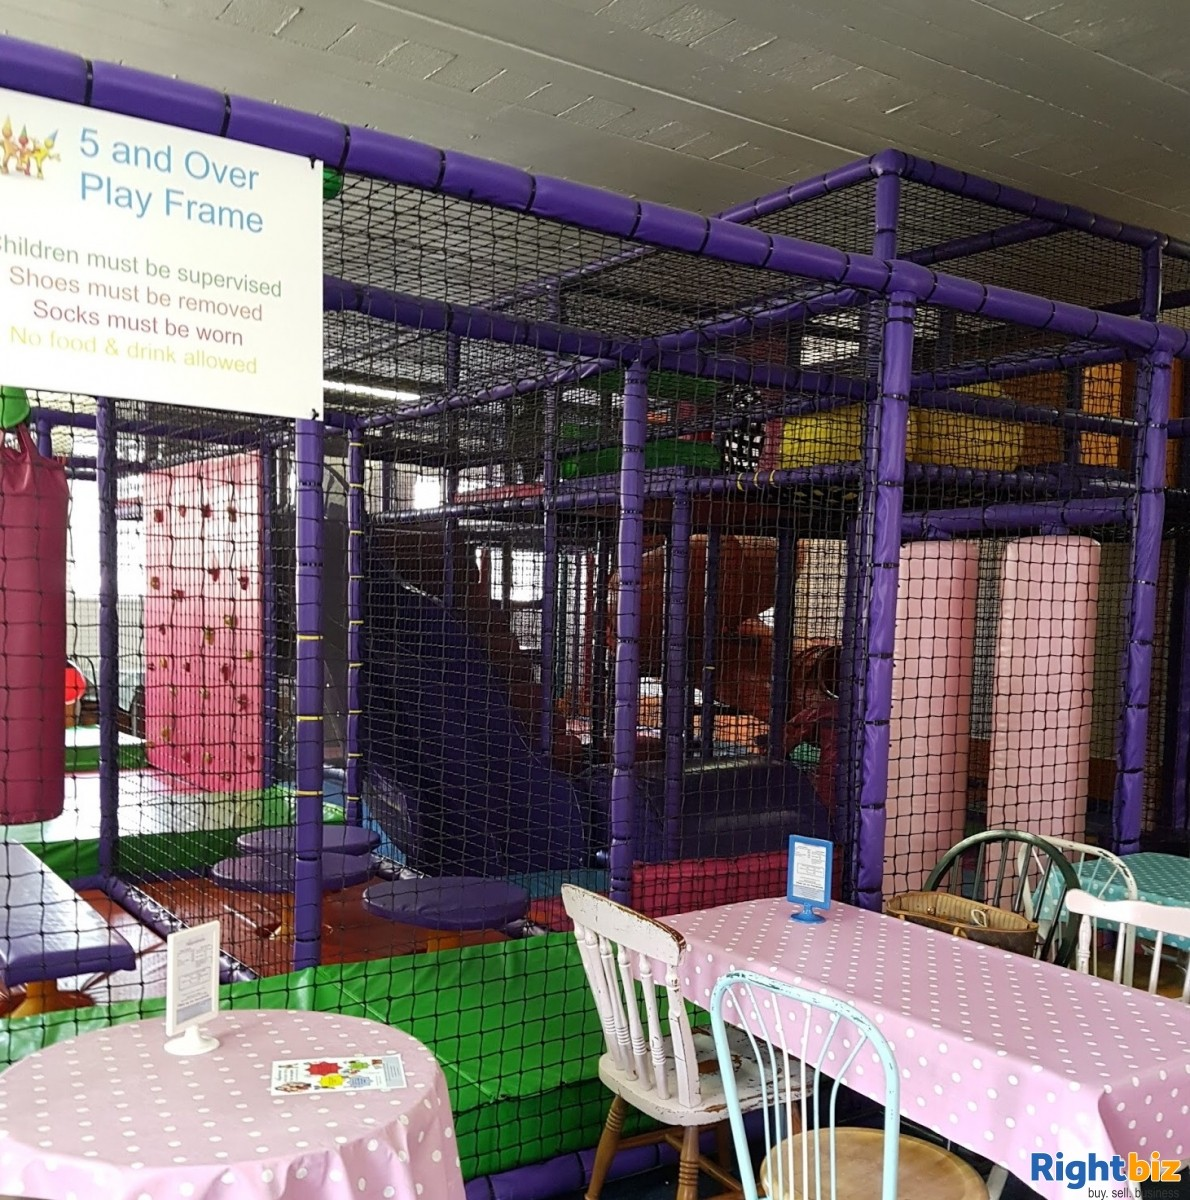 OFSTED REGISTERED CHILDCARE PROVIDER - Image 2